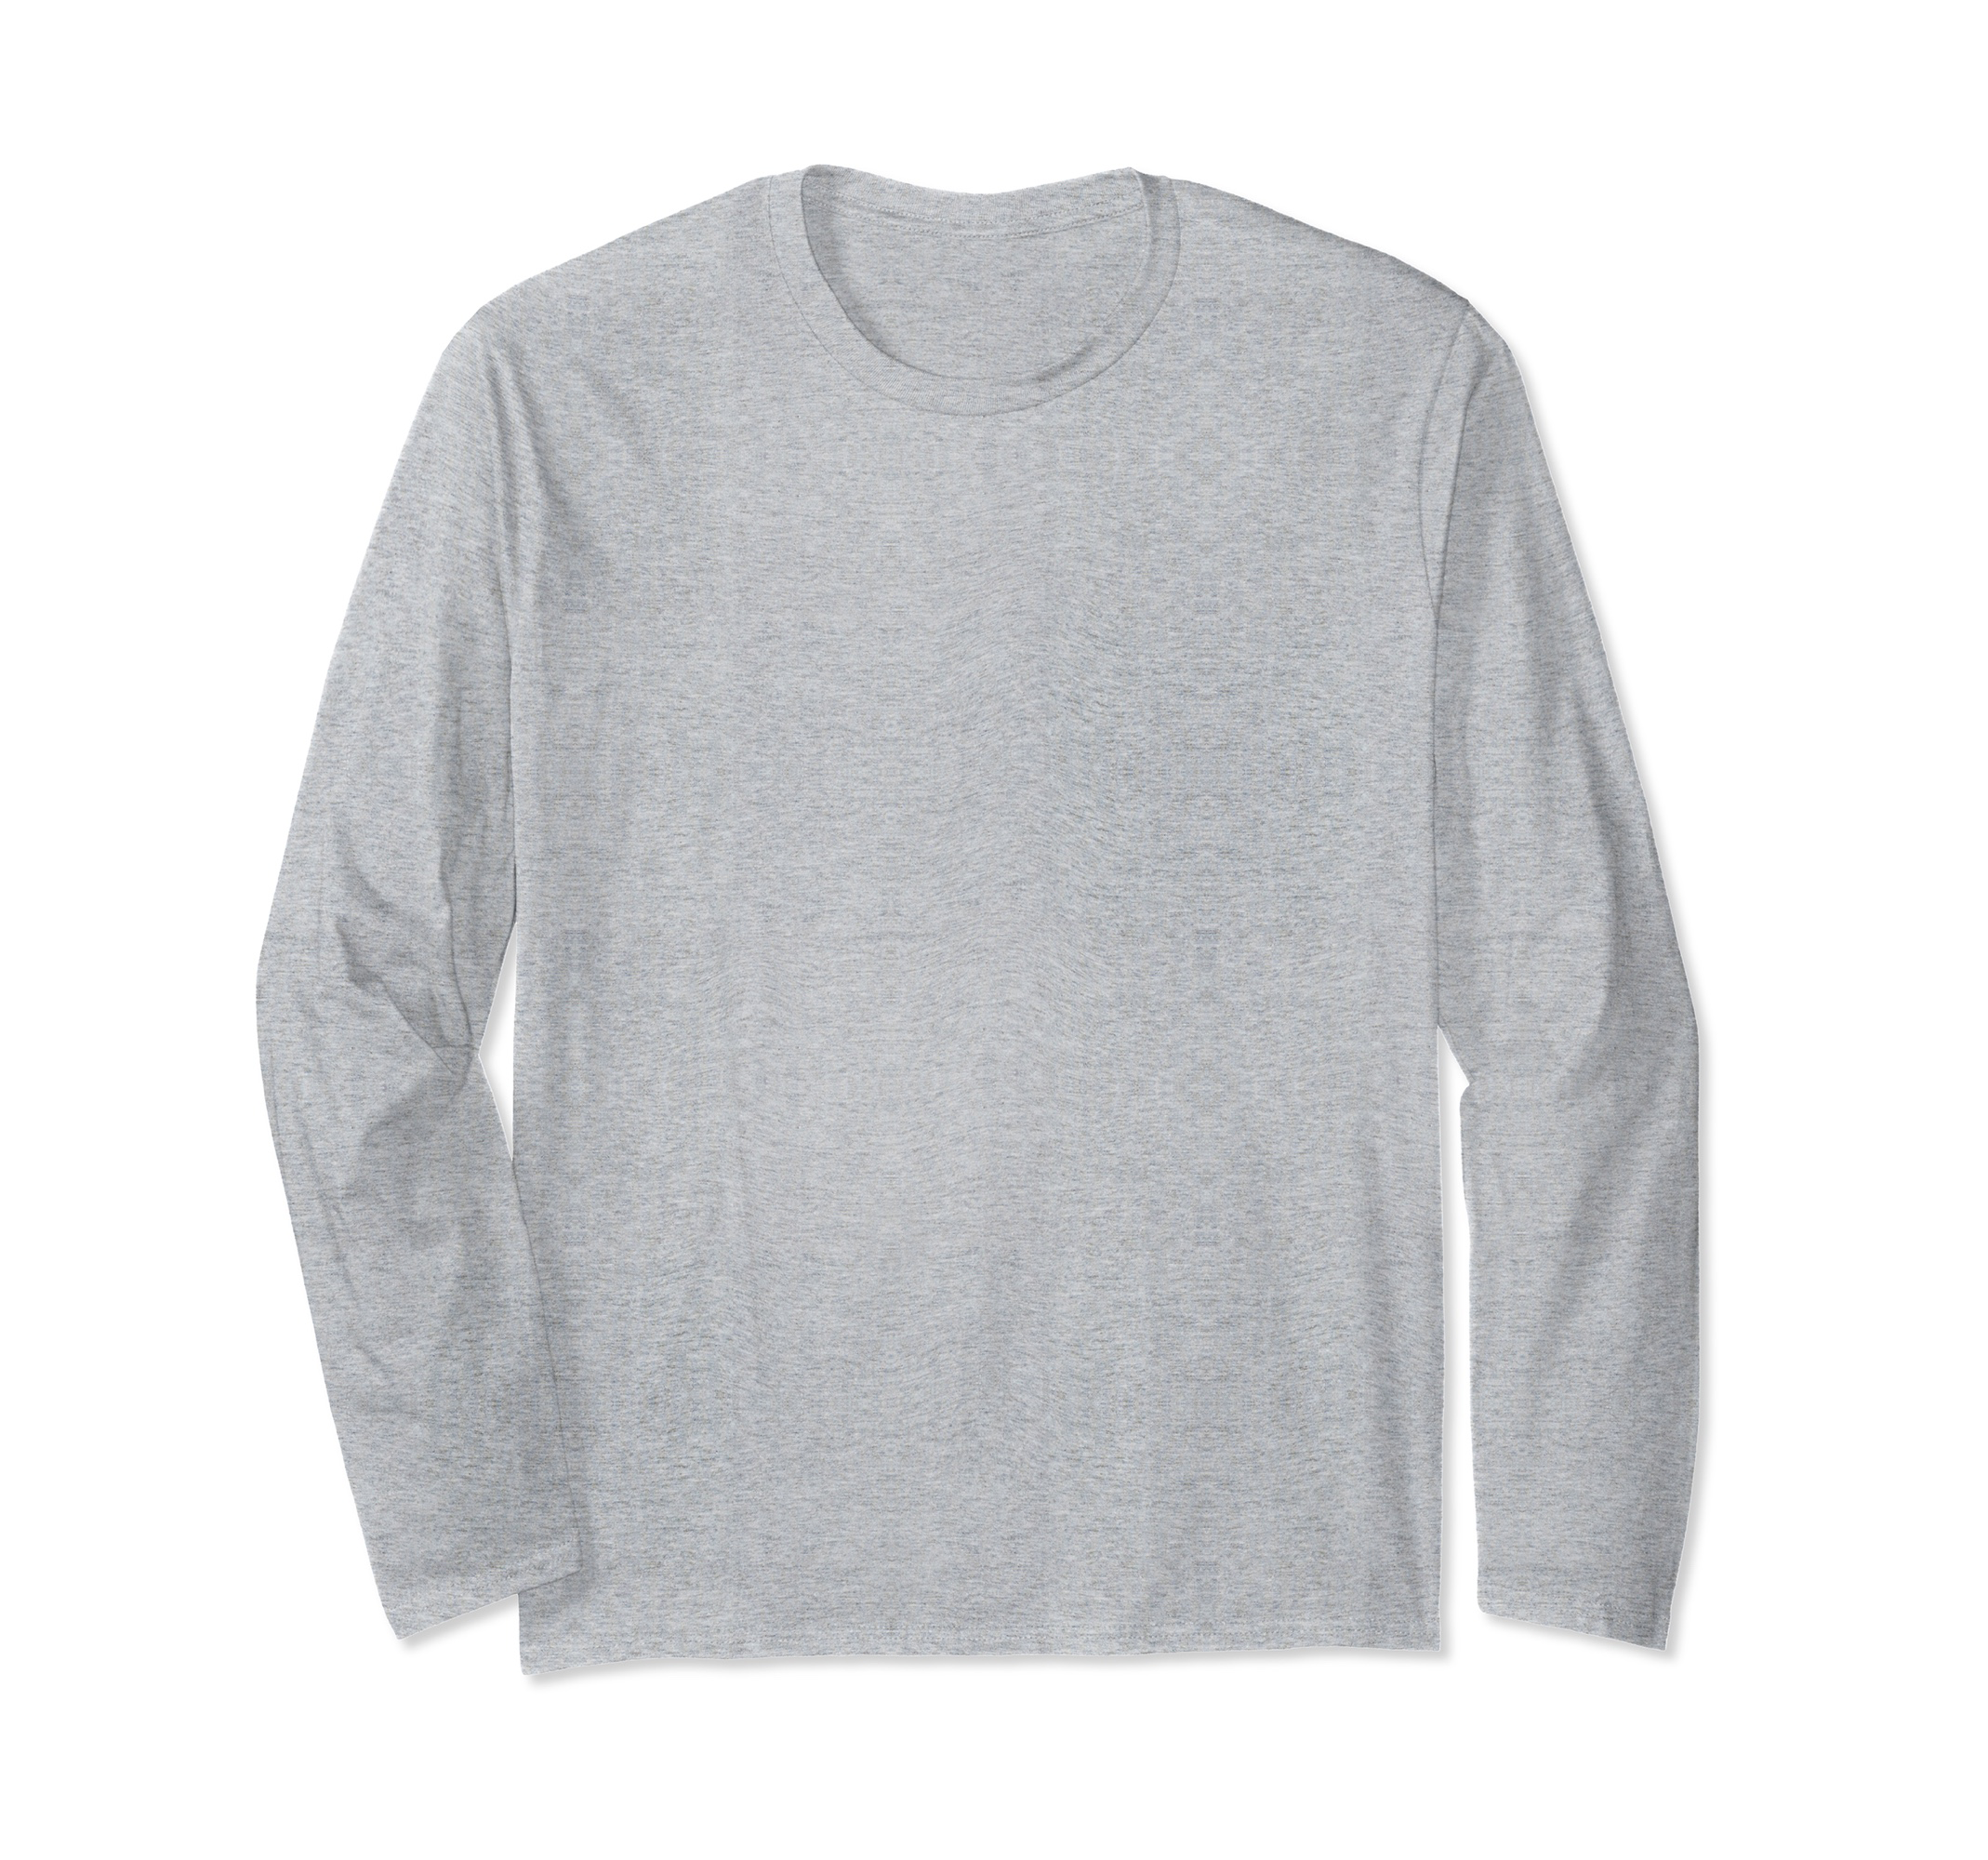 Tee Shirt Sweatshirts In Prink Aries Have Three Side T Shirt